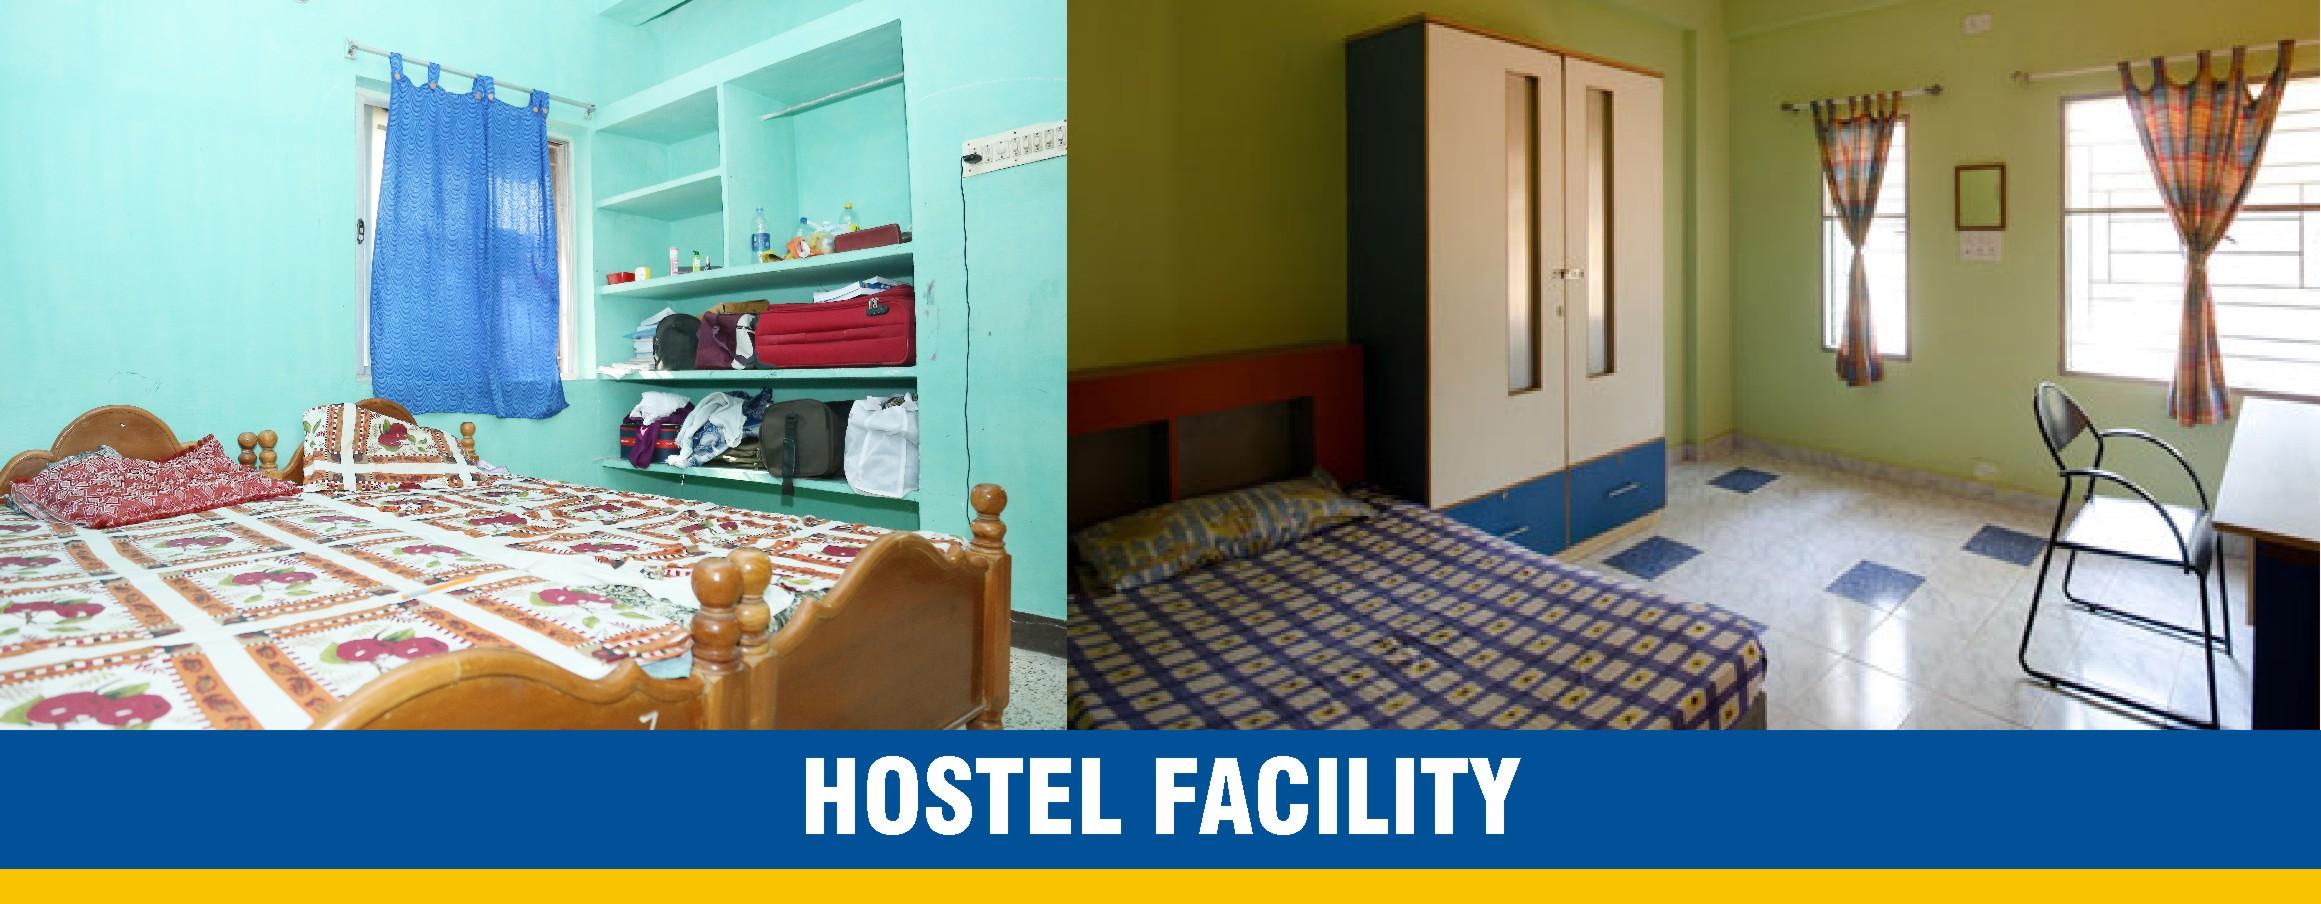 Aset Hostel Facility